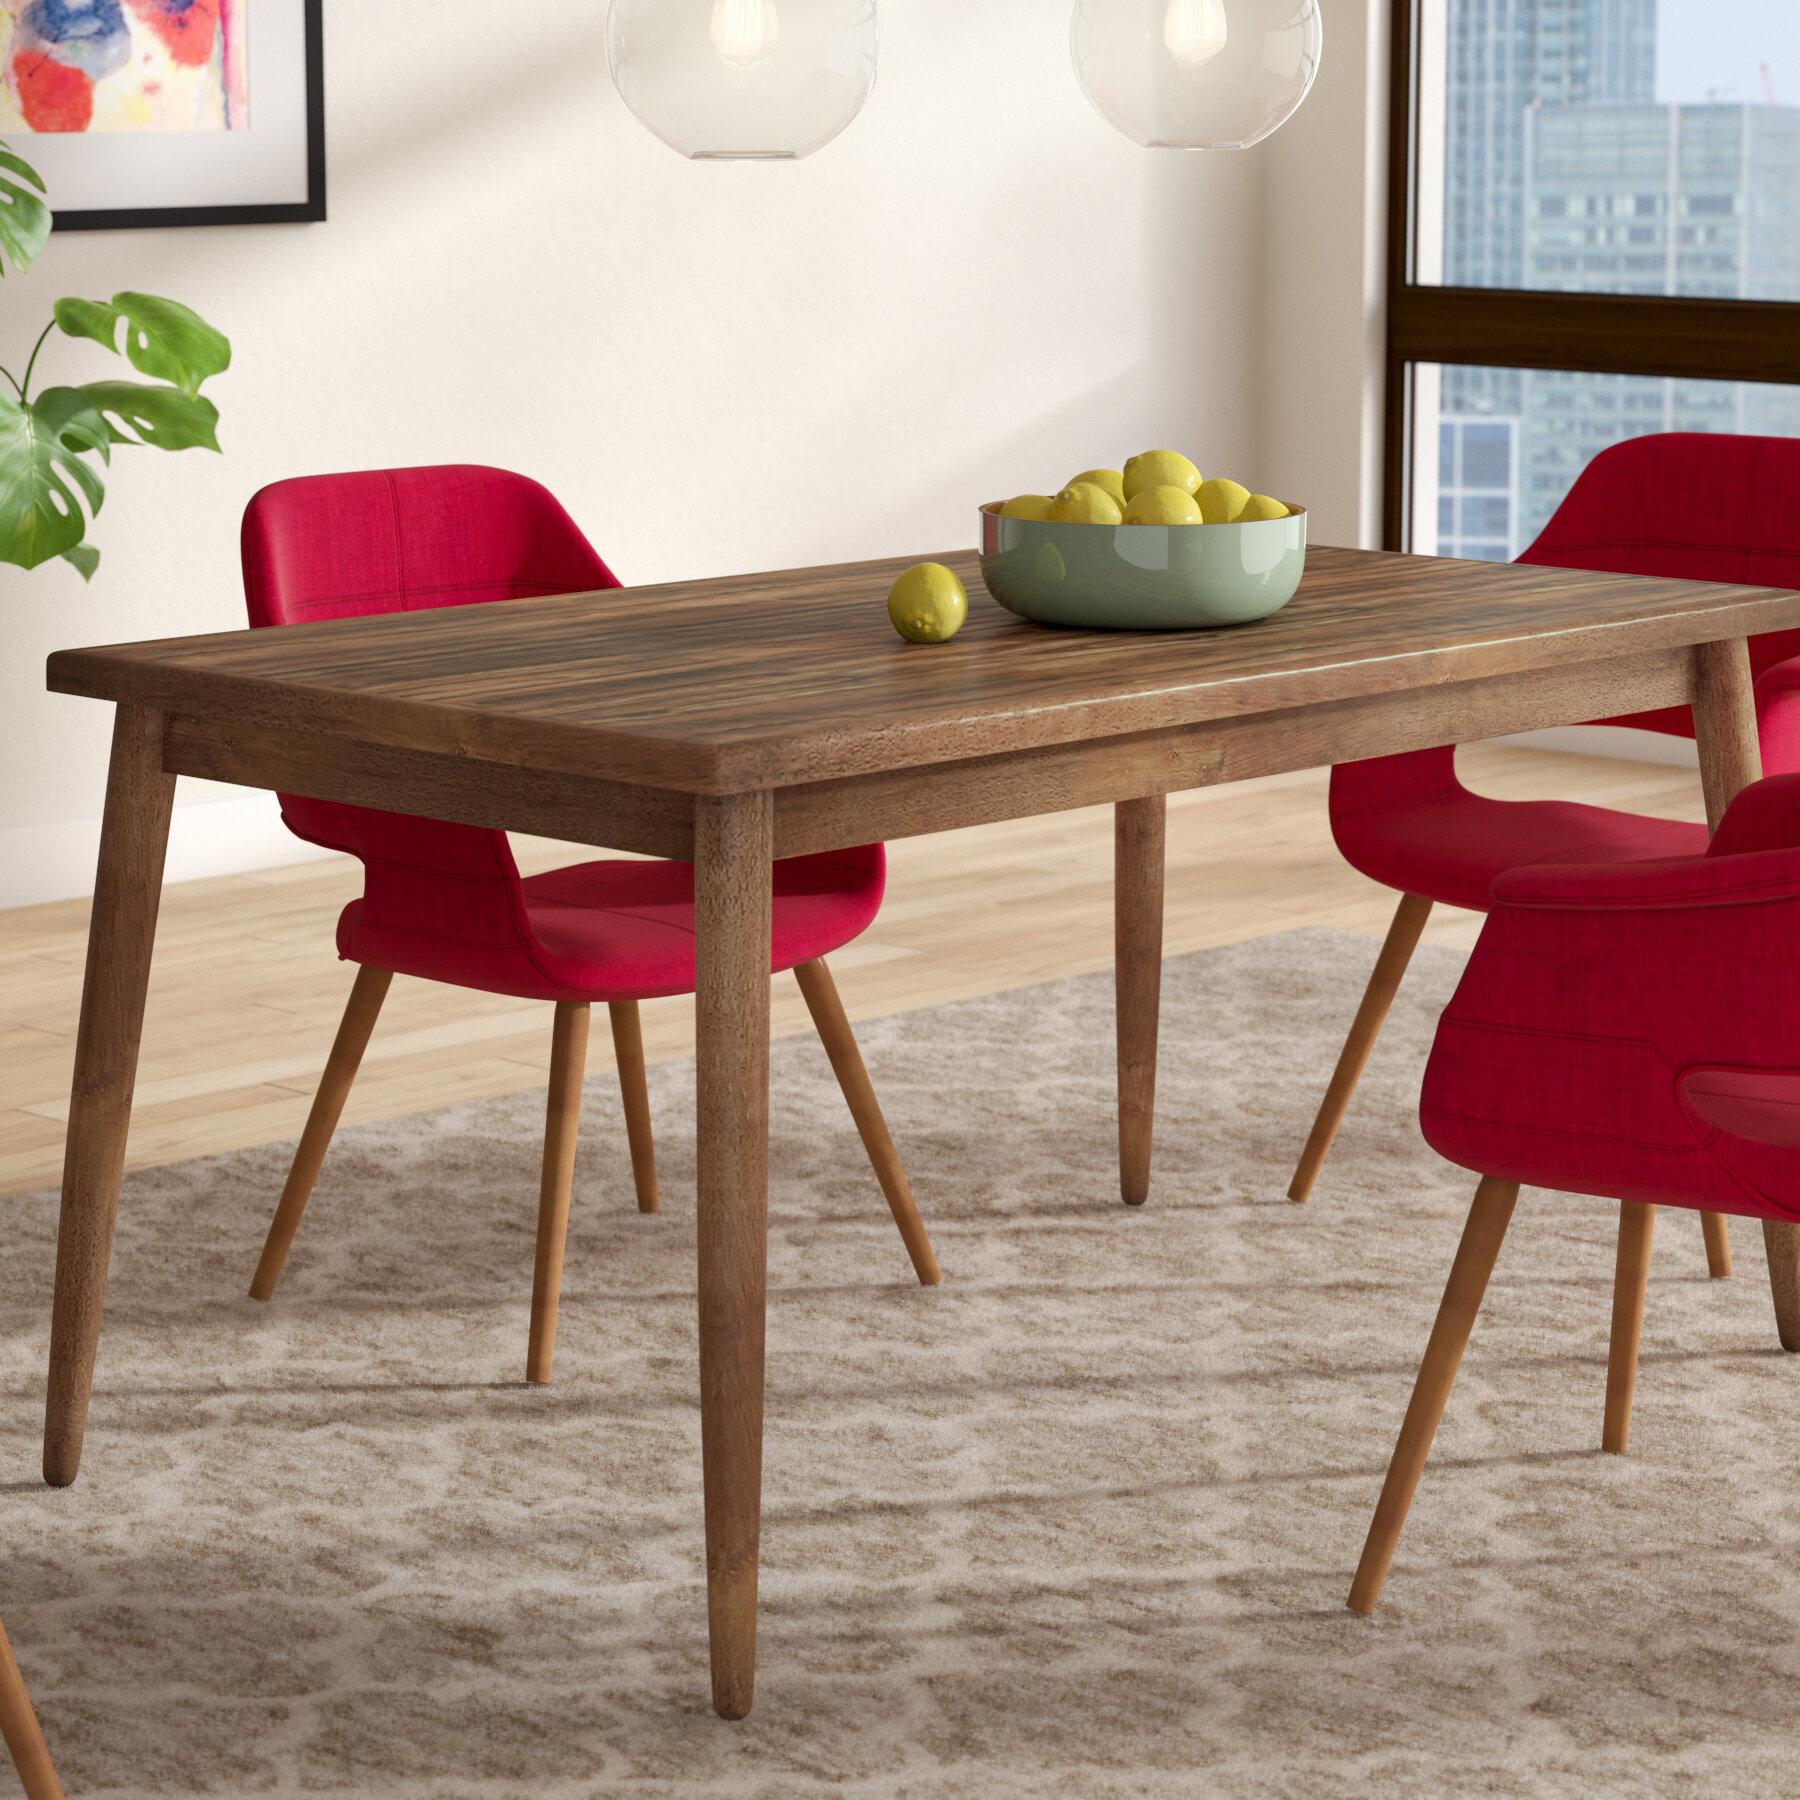 Awe Inspiring Langley Street Lydia Dining Table Reviews Wayfair Alphanode Cool Chair Designs And Ideas Alphanodeonline